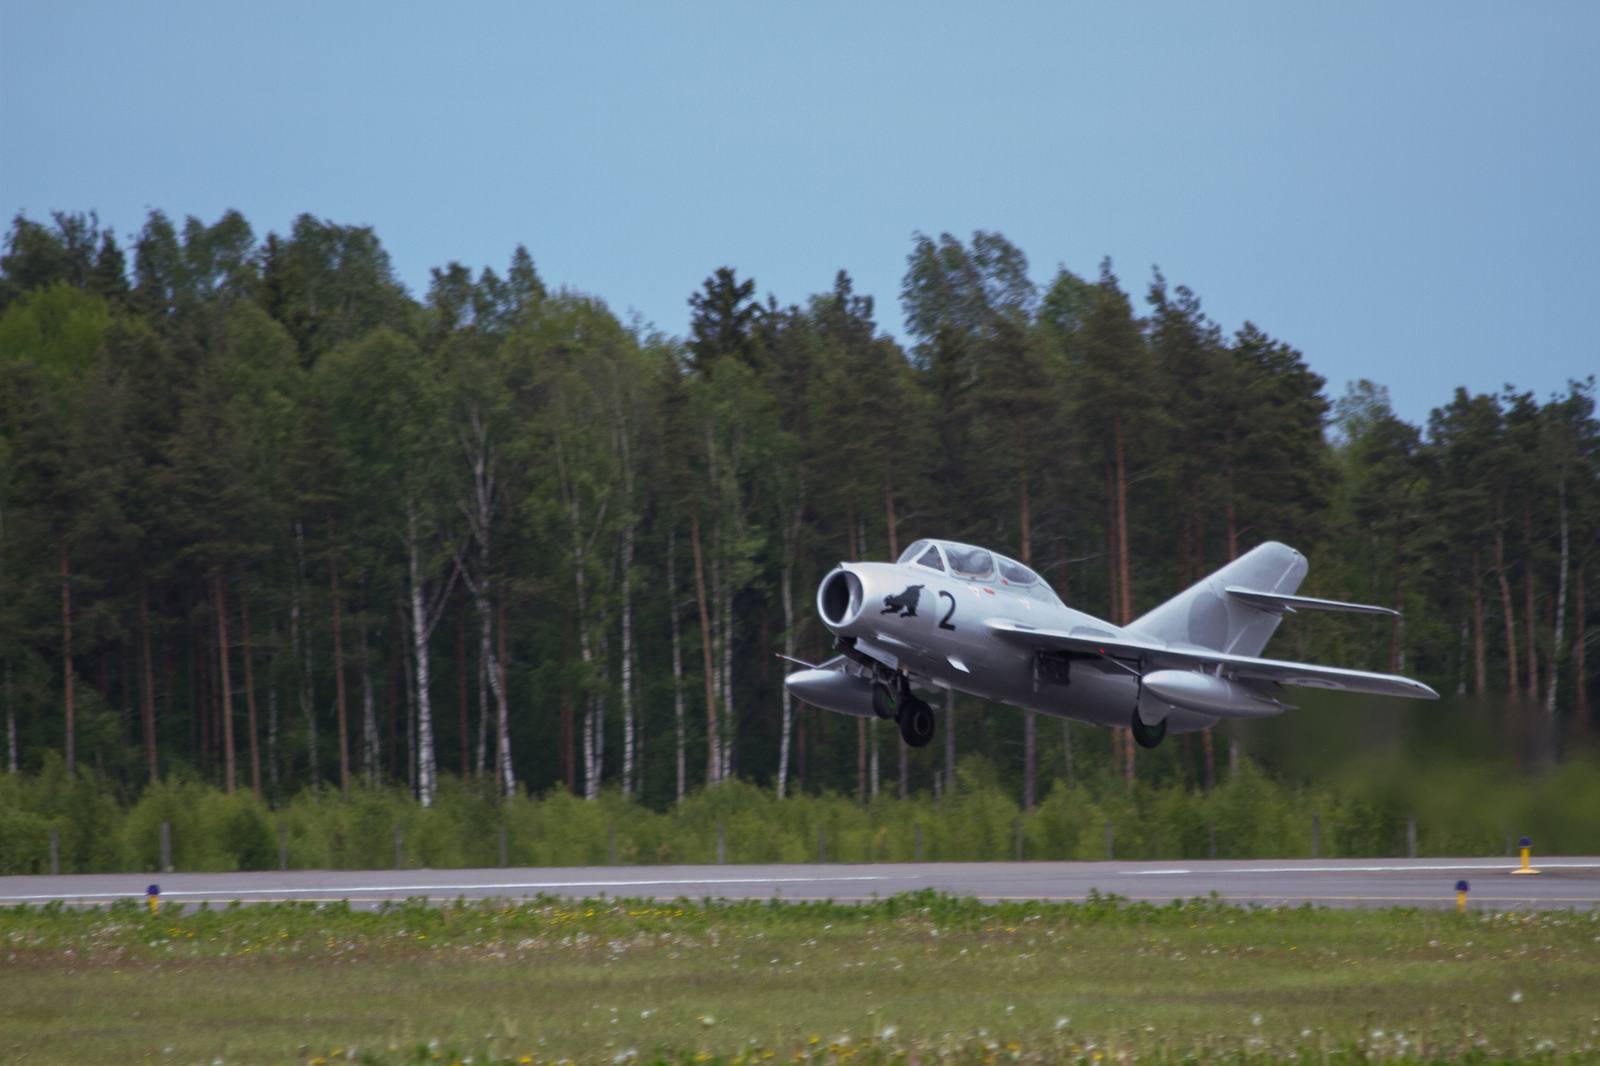 airshow 20158 Turku International Airshow 2015